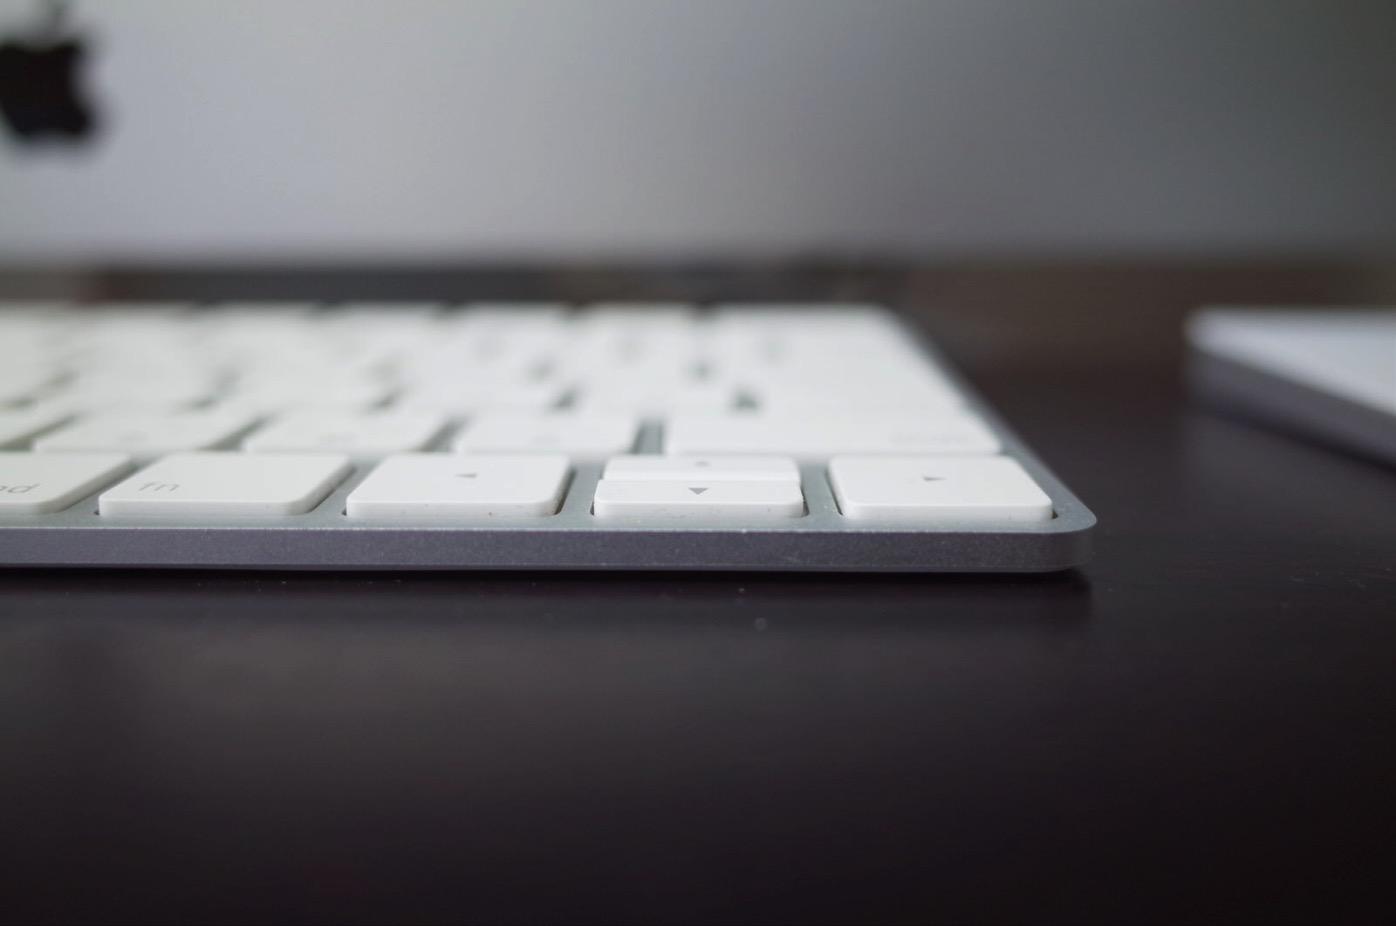 Magic Keyboard(テンキー付き)- 日本語(JIS)-8